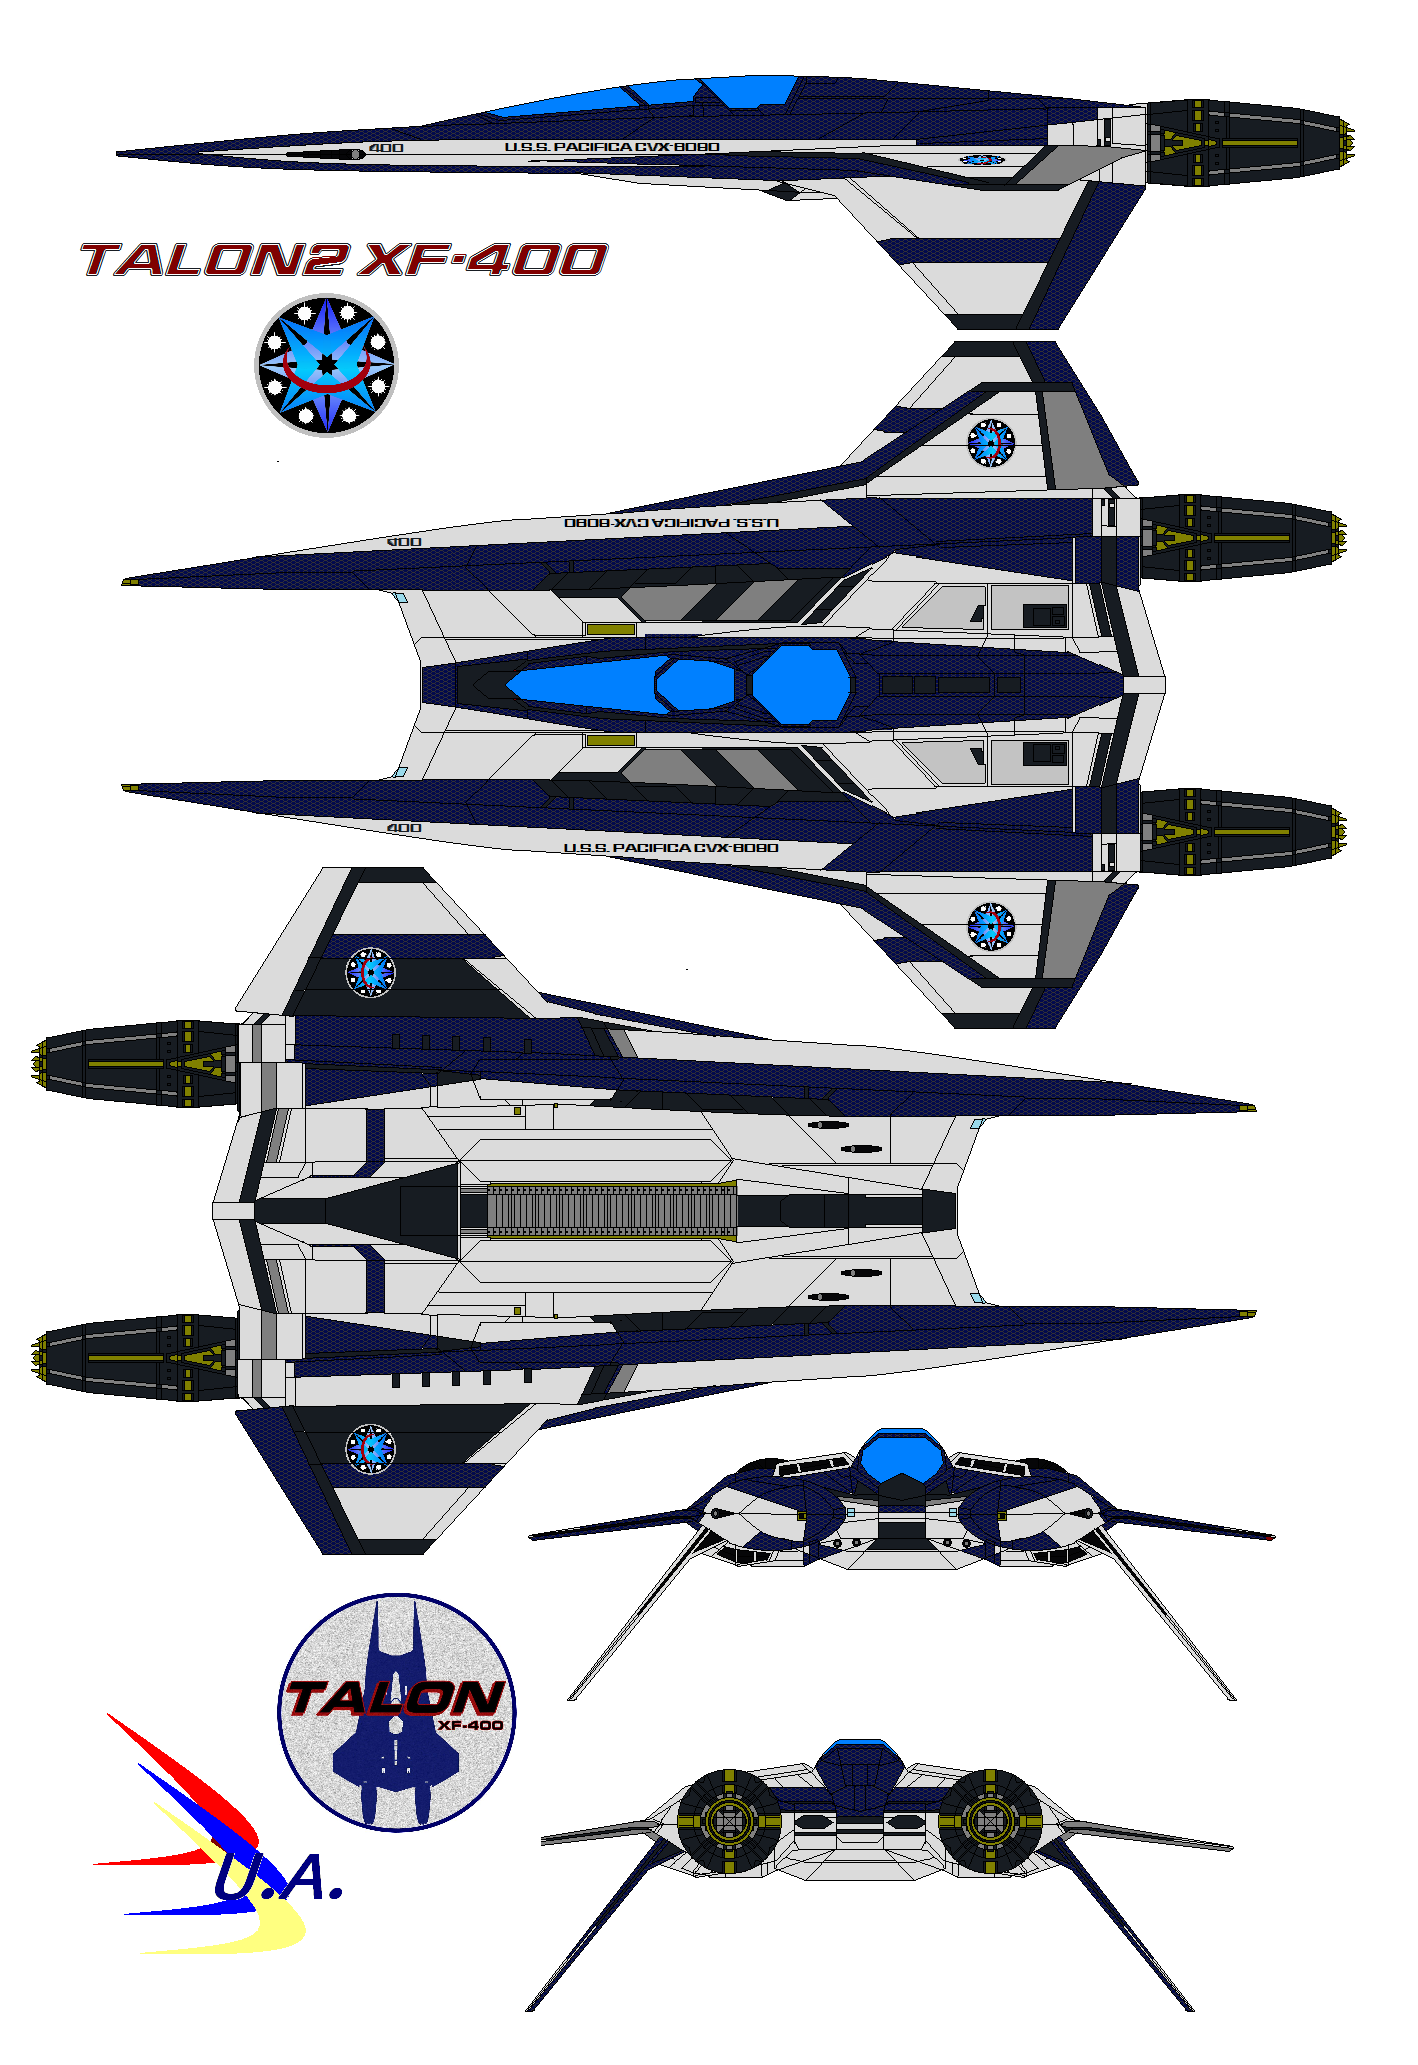 Talon2 Xf 400 U S S Pacifica By Bagera3005 On Deviantart